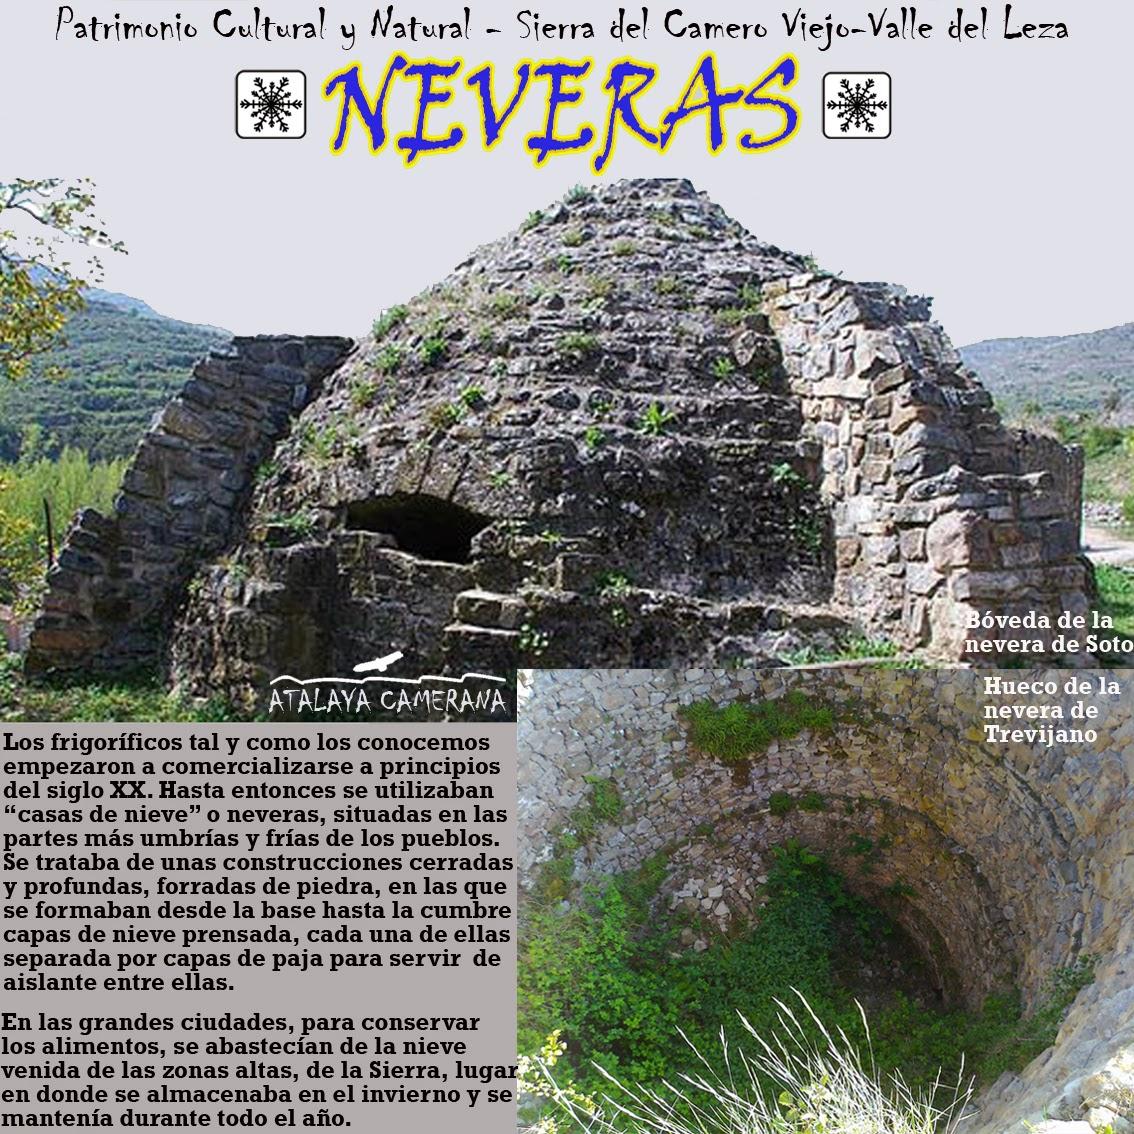 Sierra del Camero Viejo - Valle del Leza. Patrimonio Cultural y Natural. Neveras.